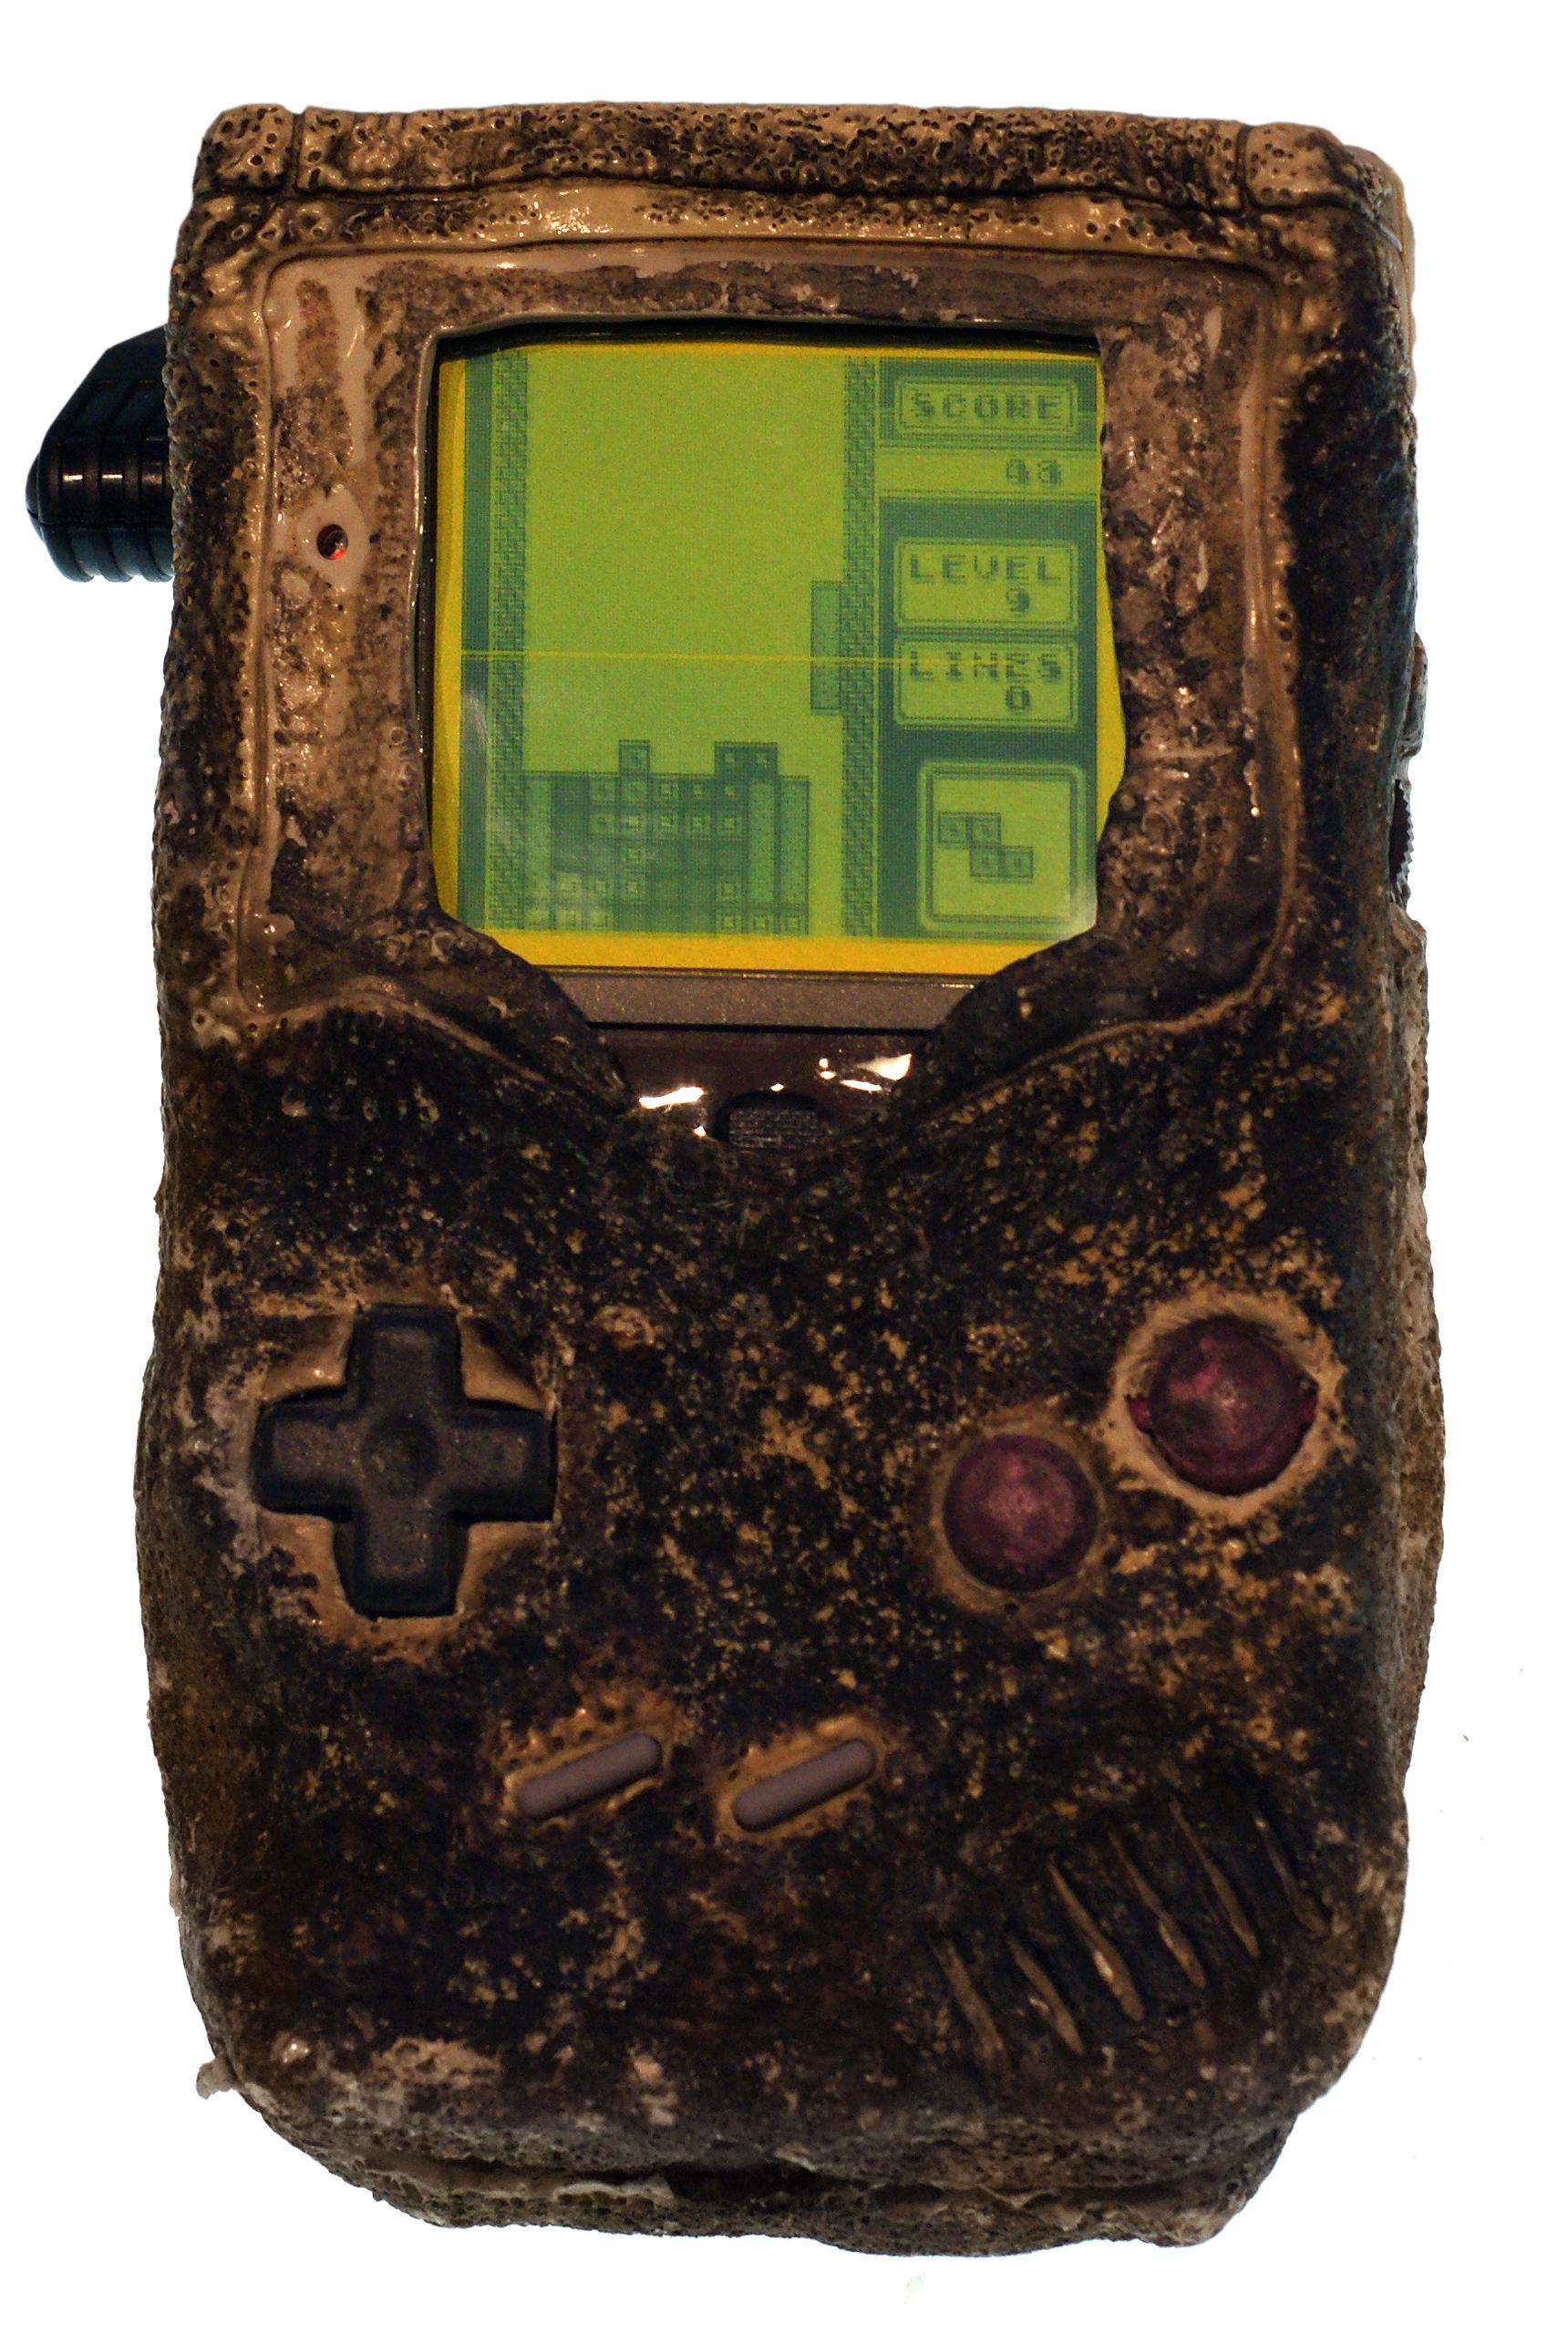 Description Game-Boy-Gulf-War-Damaged.jpg